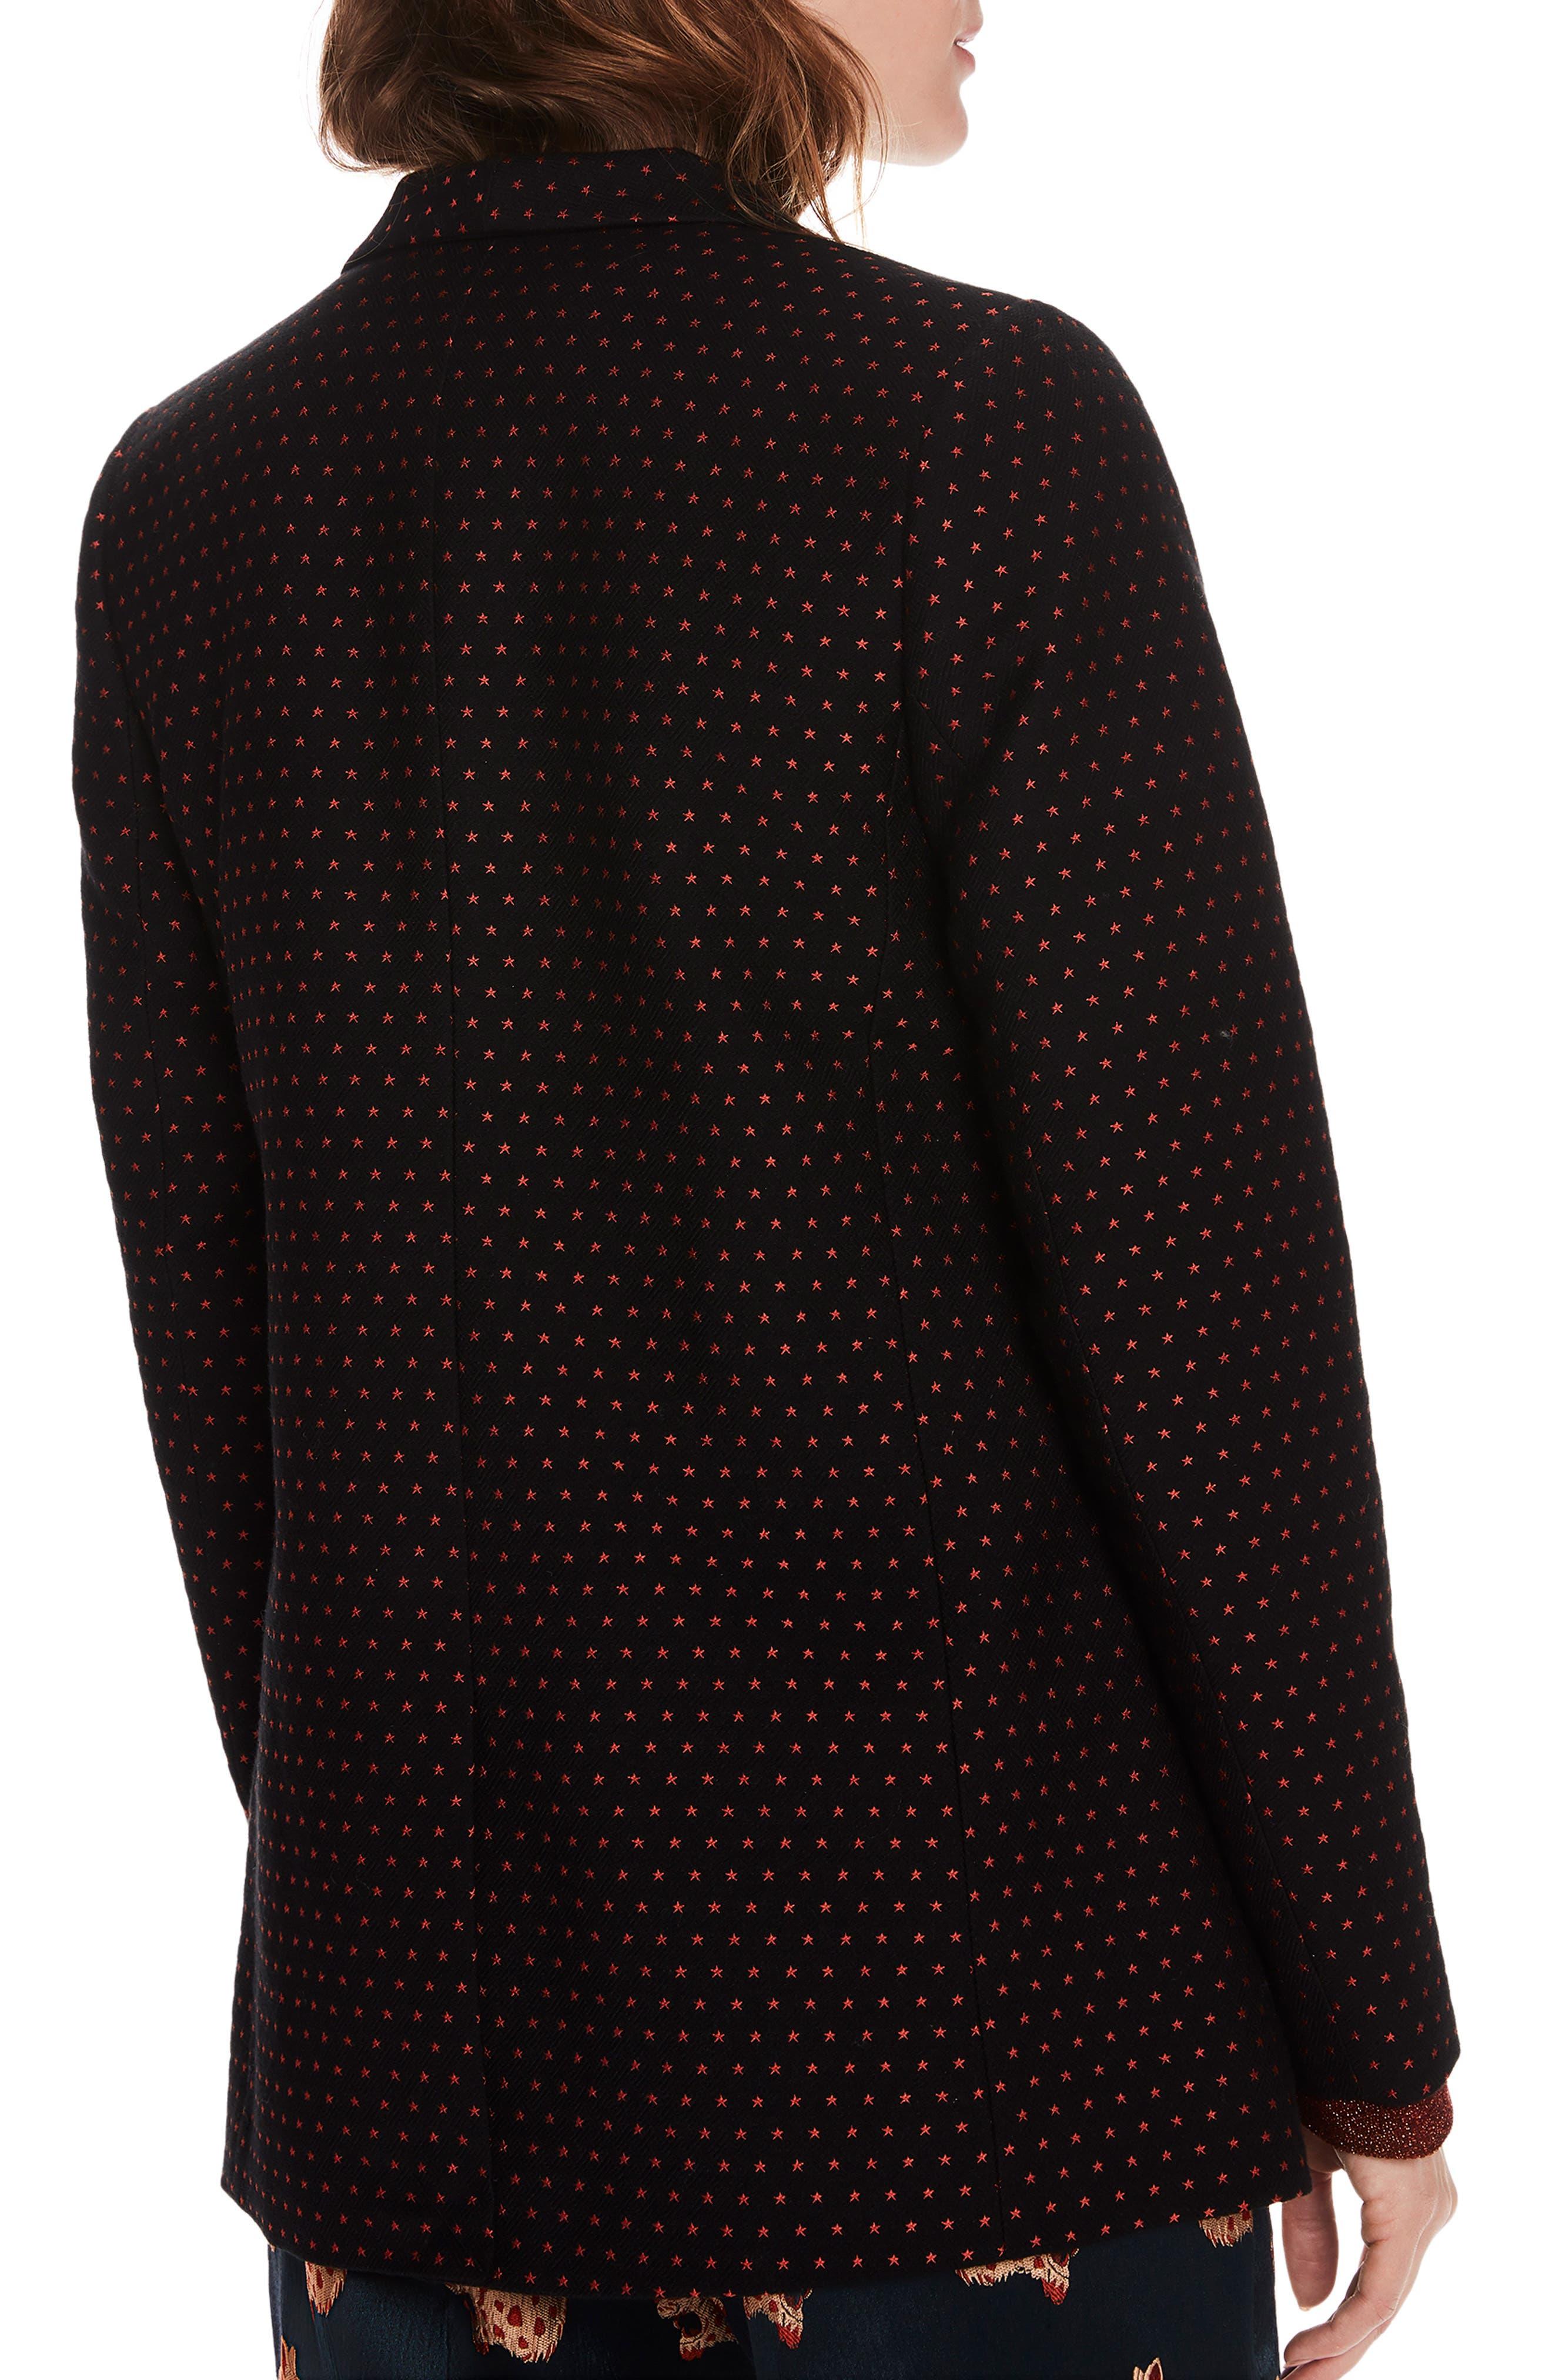 SCOTCH & SODA,                             Tailored Stretch Jacquard Blazer,                             Alternate thumbnail 2, color,                             BLACK W/ SMALL STAR PRINT